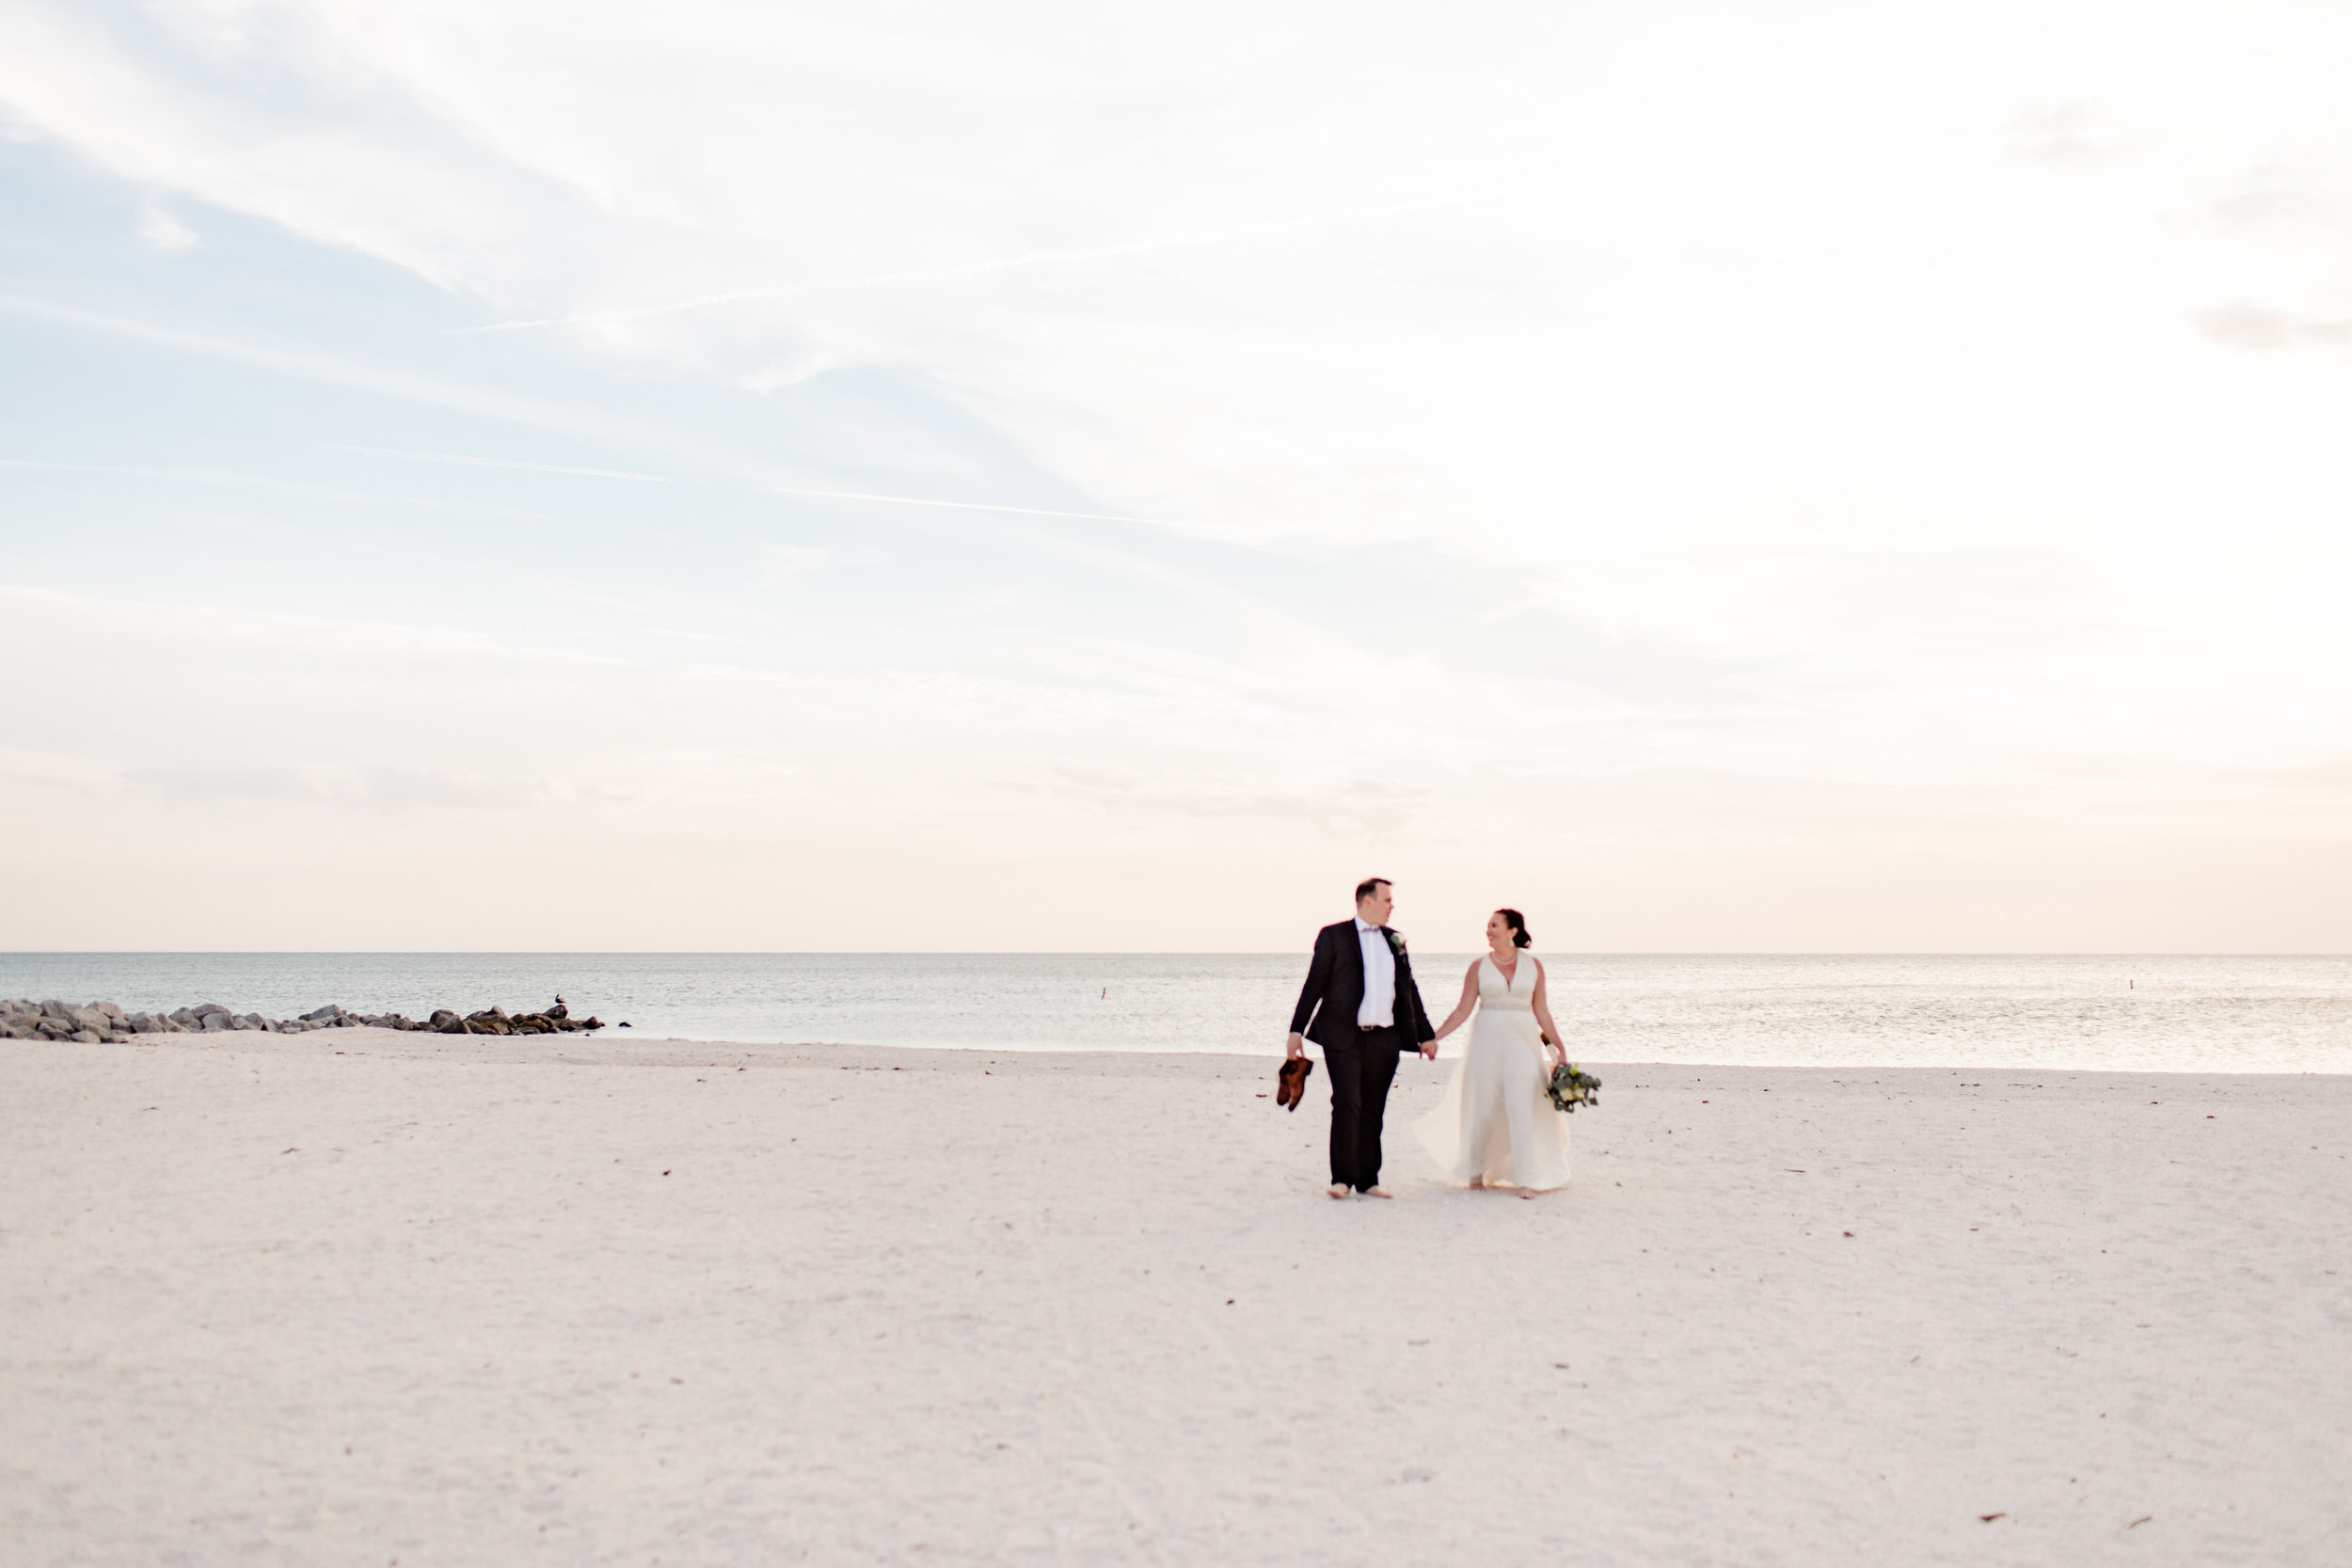 Beltran_Treasure_Island_Elopement_Tampa_Wedding_138-1.jpg